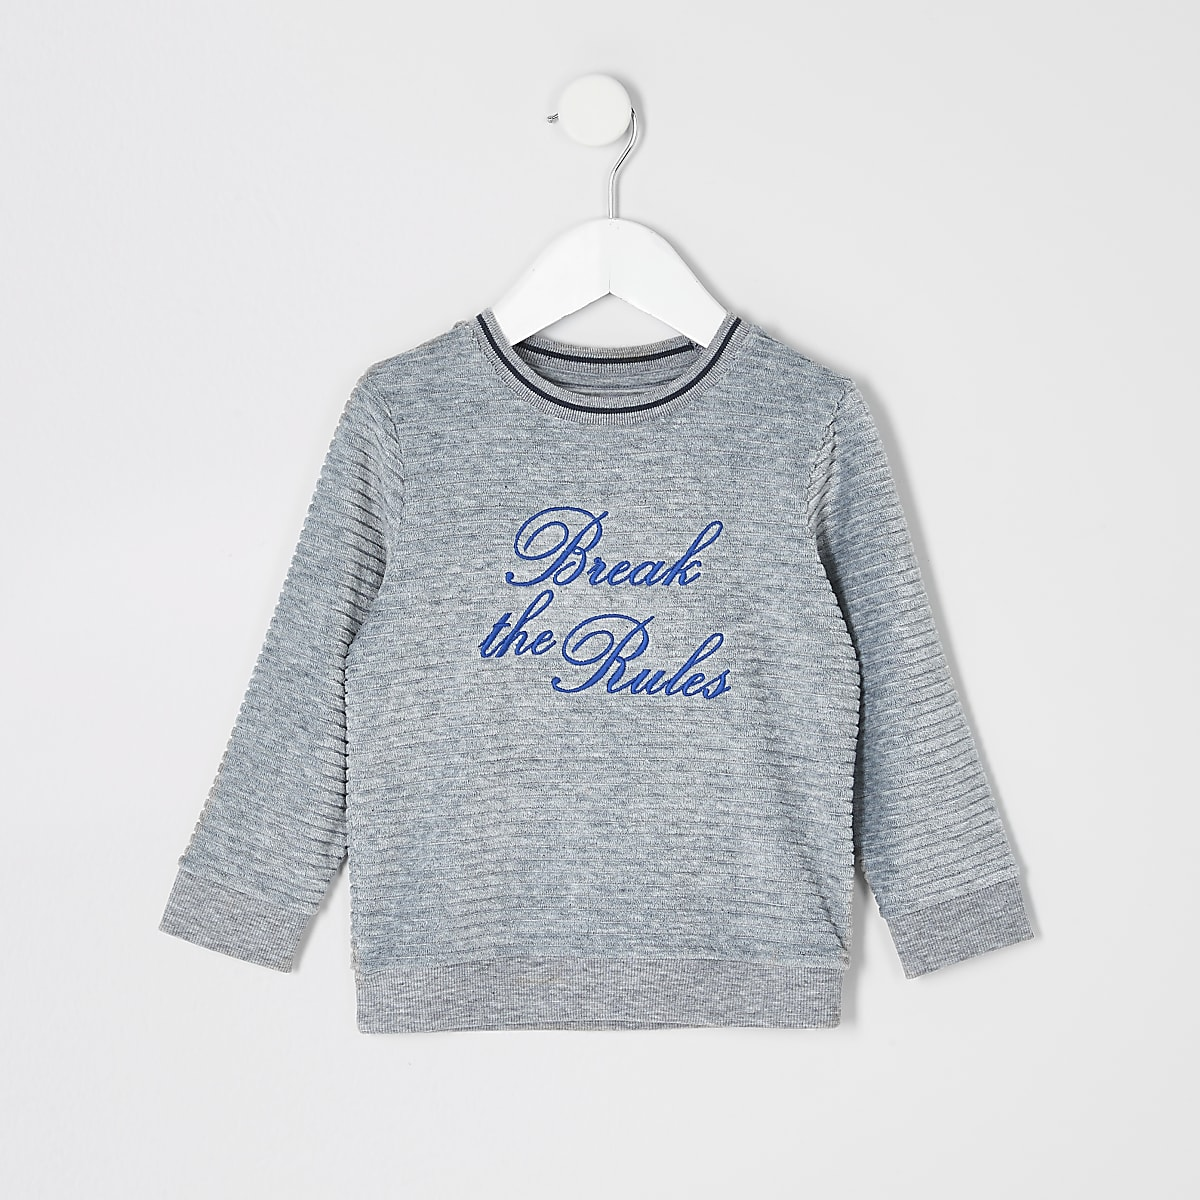 Mini boys grey 'Break the rules' jumper